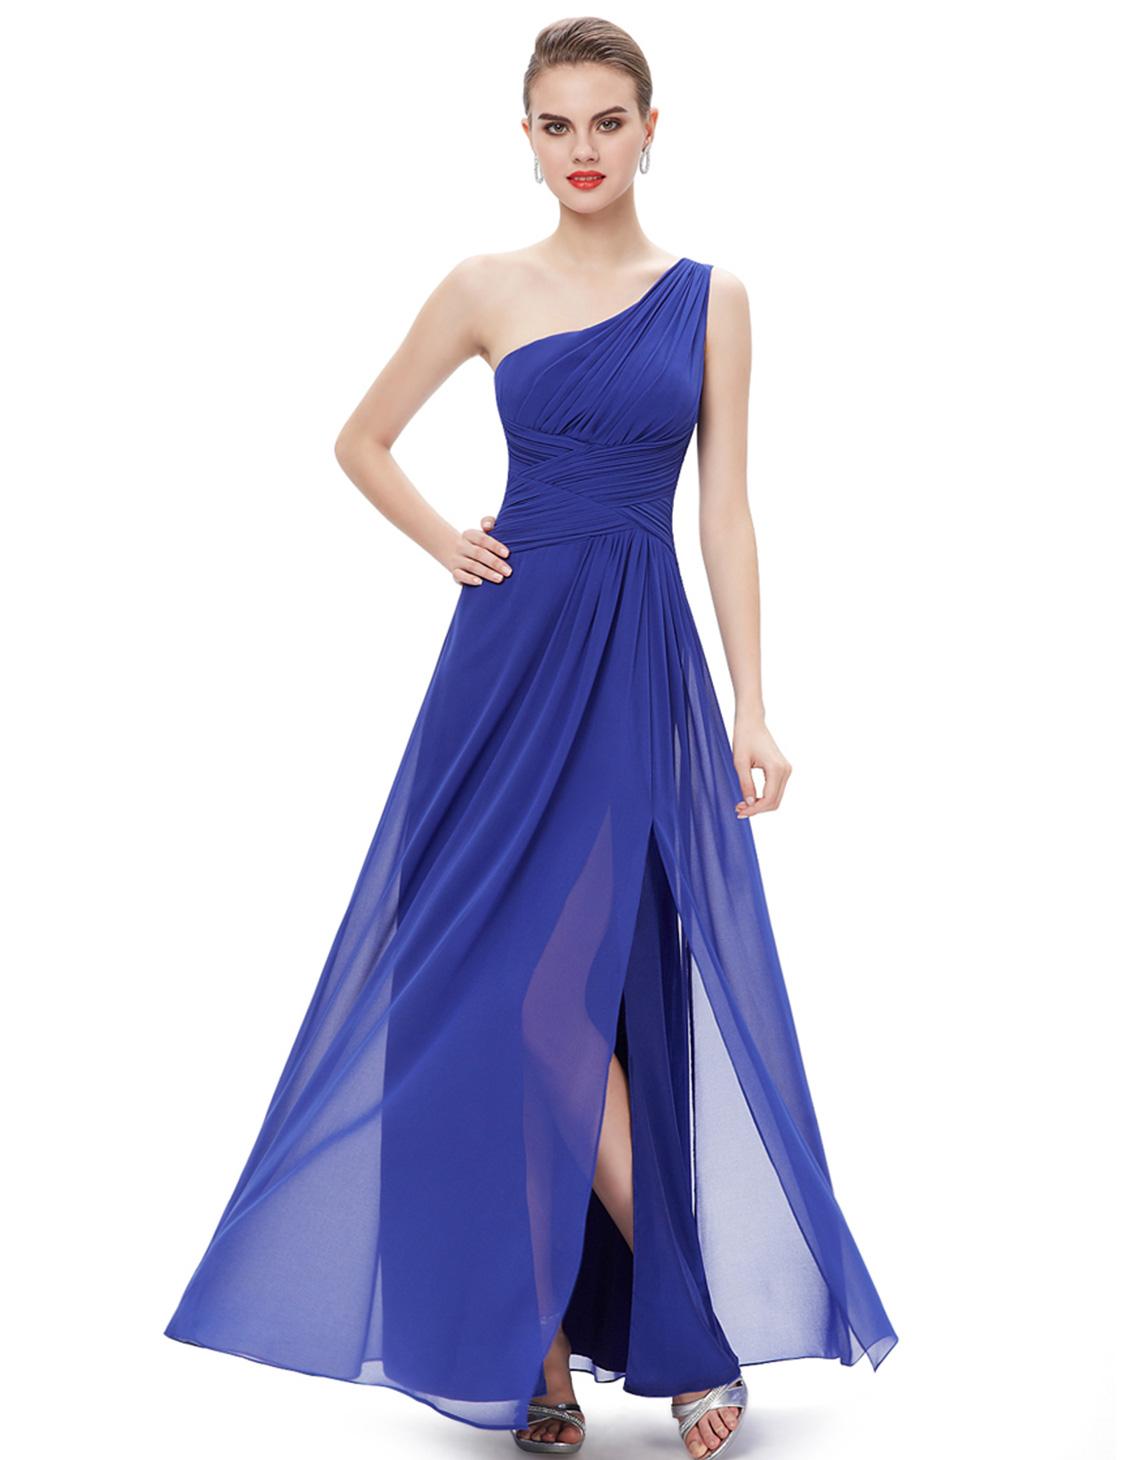 Fashion one shoulder bridesmaid dresses homecoming party gown fashion one shoulder bridesmaid dresses homecoming party gown ombrellifo Images